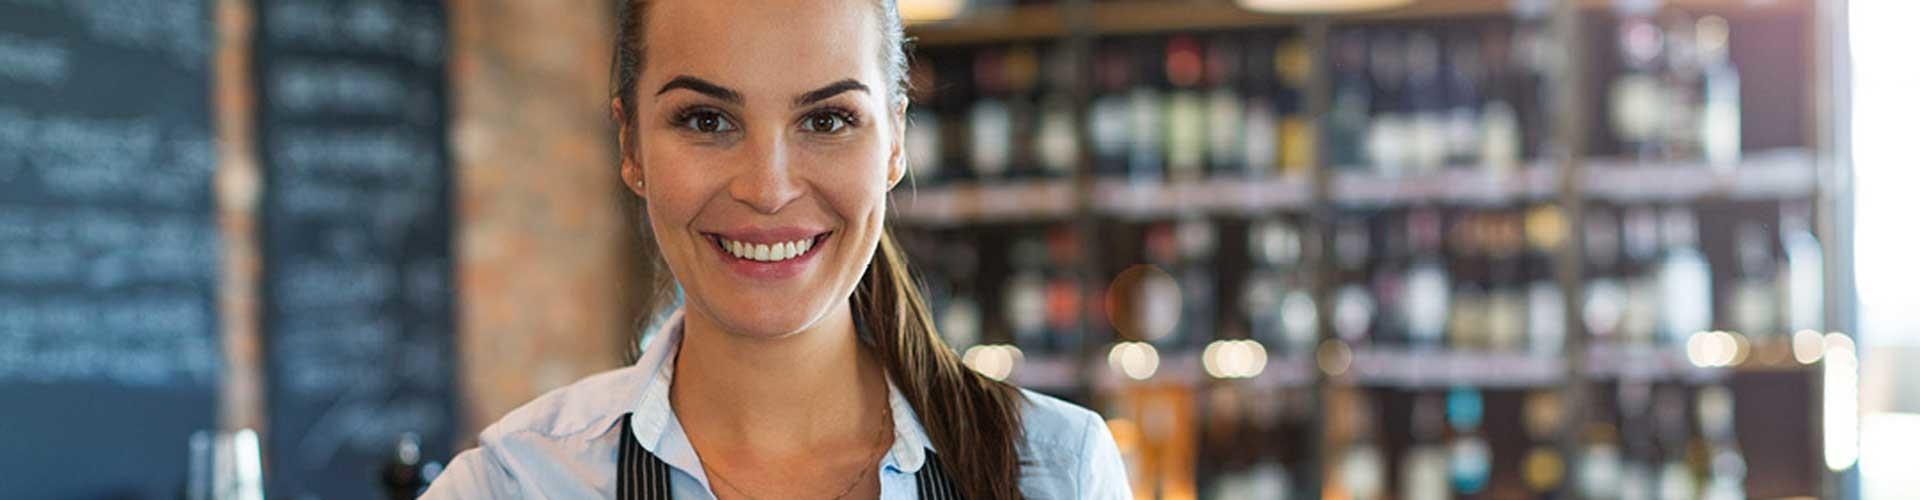 Frau lächelt © Adobe Stock, Adobe Stock